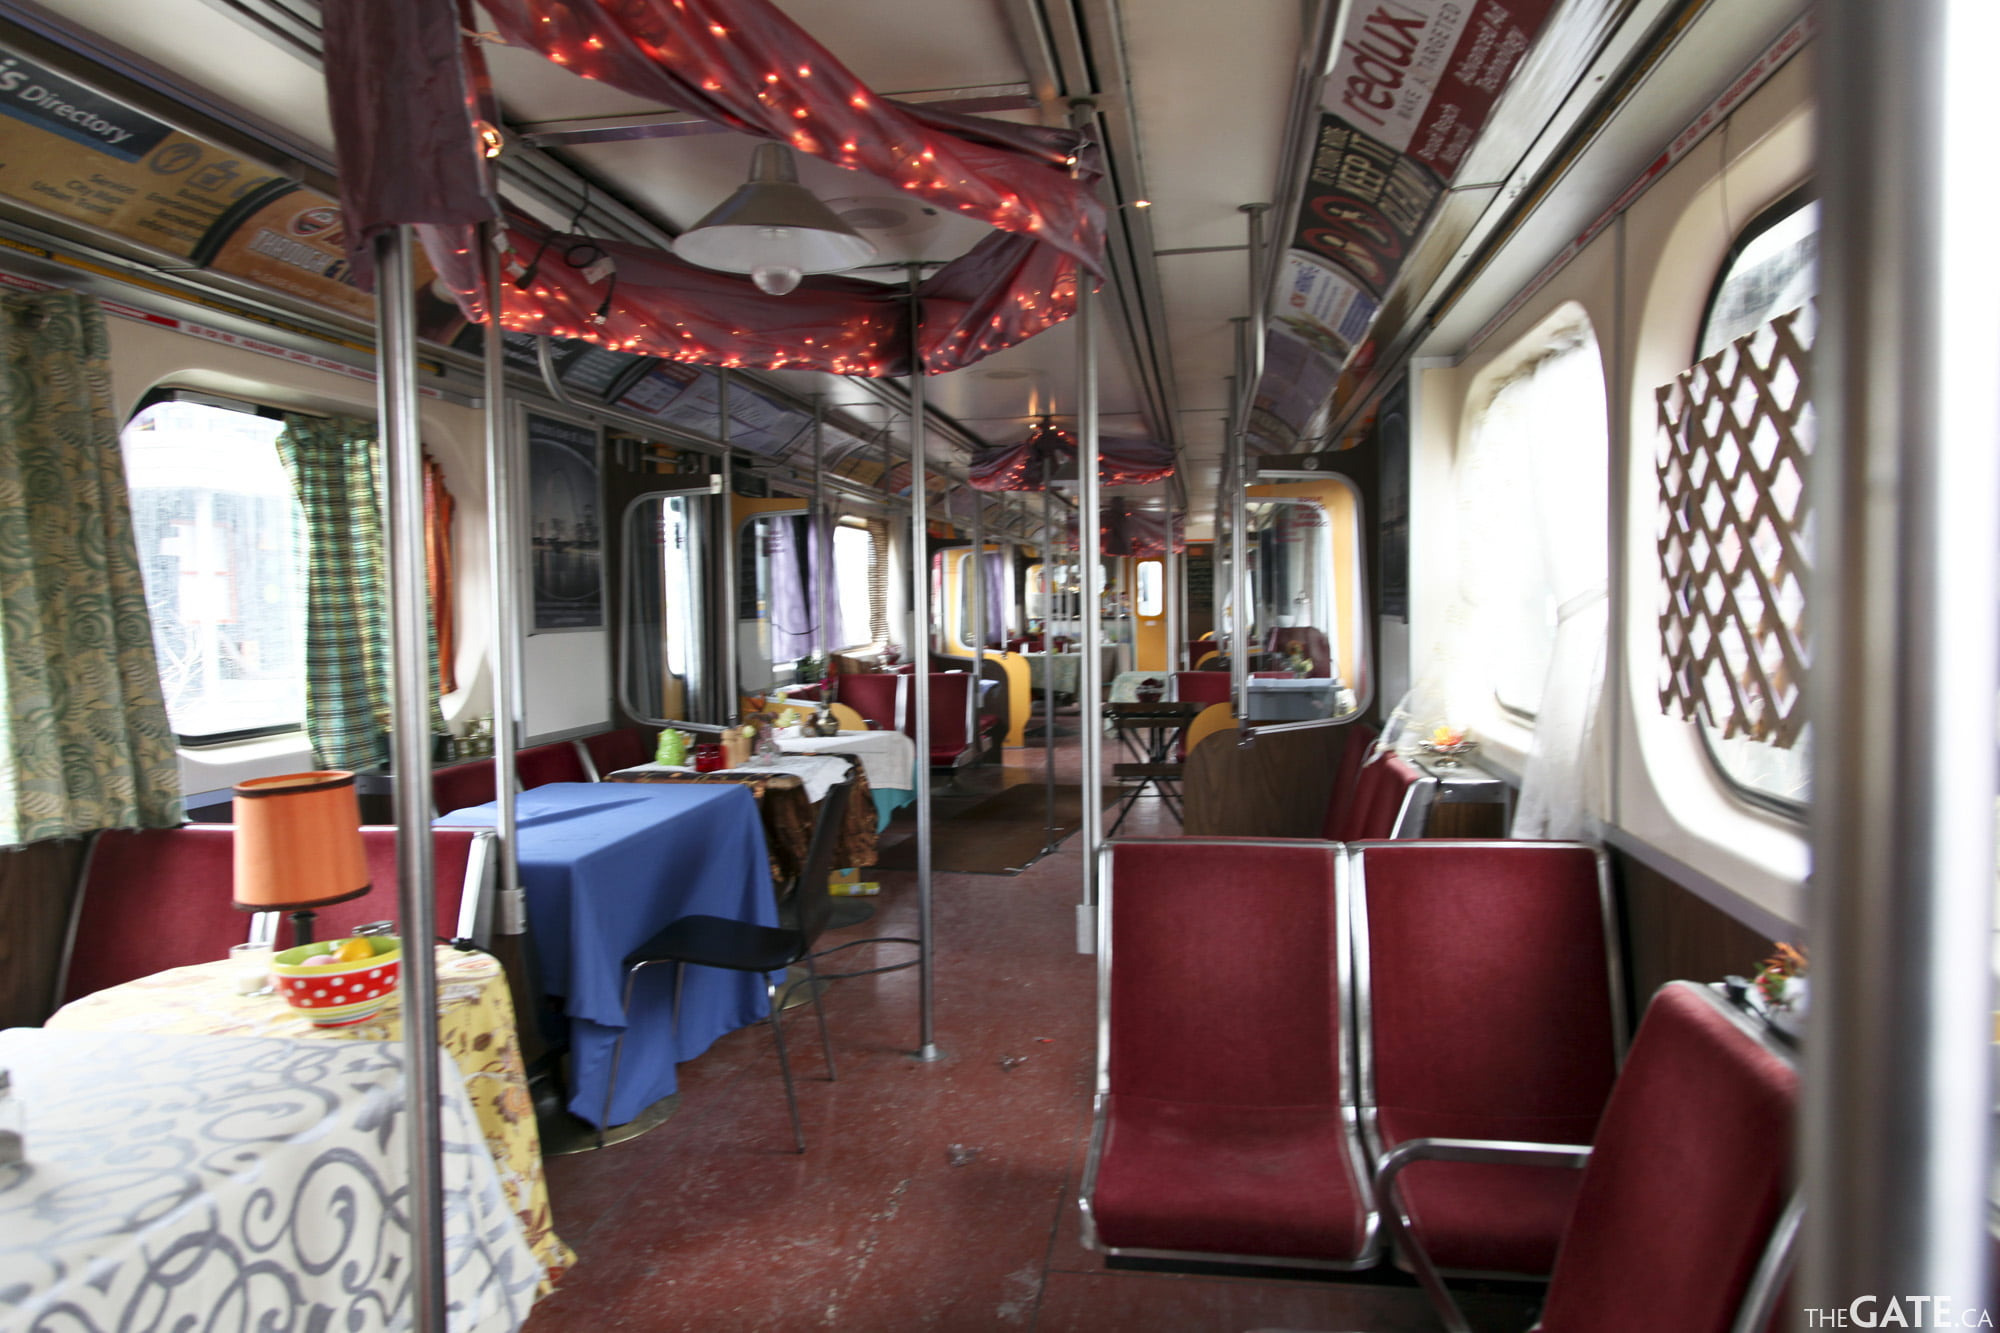 Inside the train cafe #2